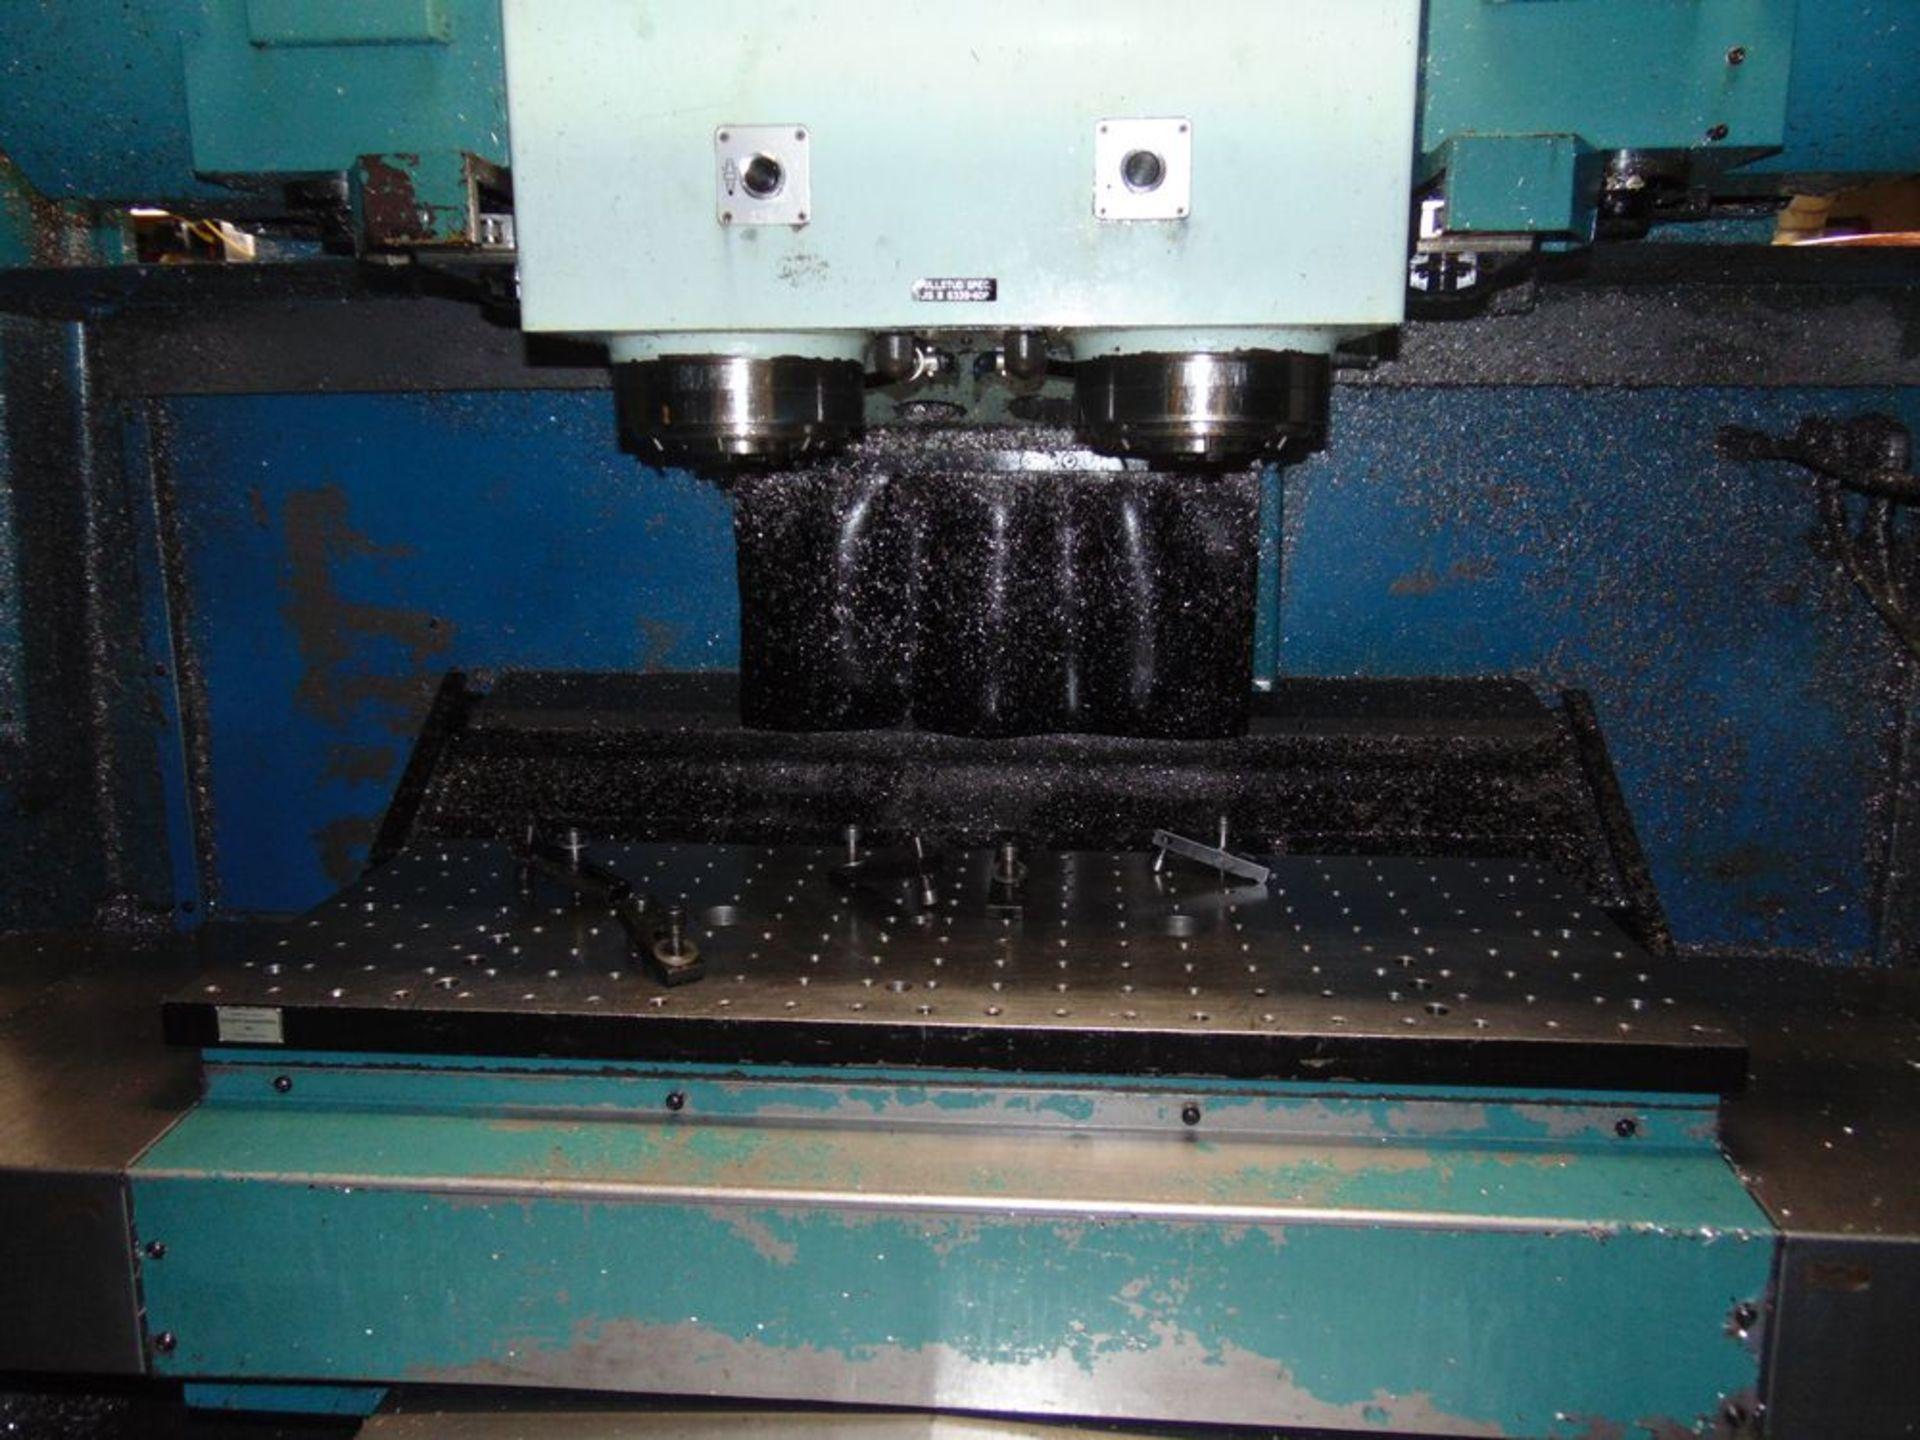 Lot 24 - (1997) Matsuura mod. MC800 VFDC, 4-Axis CNC Twin Spindle Vertical Machine Center, Yasnac Controls,